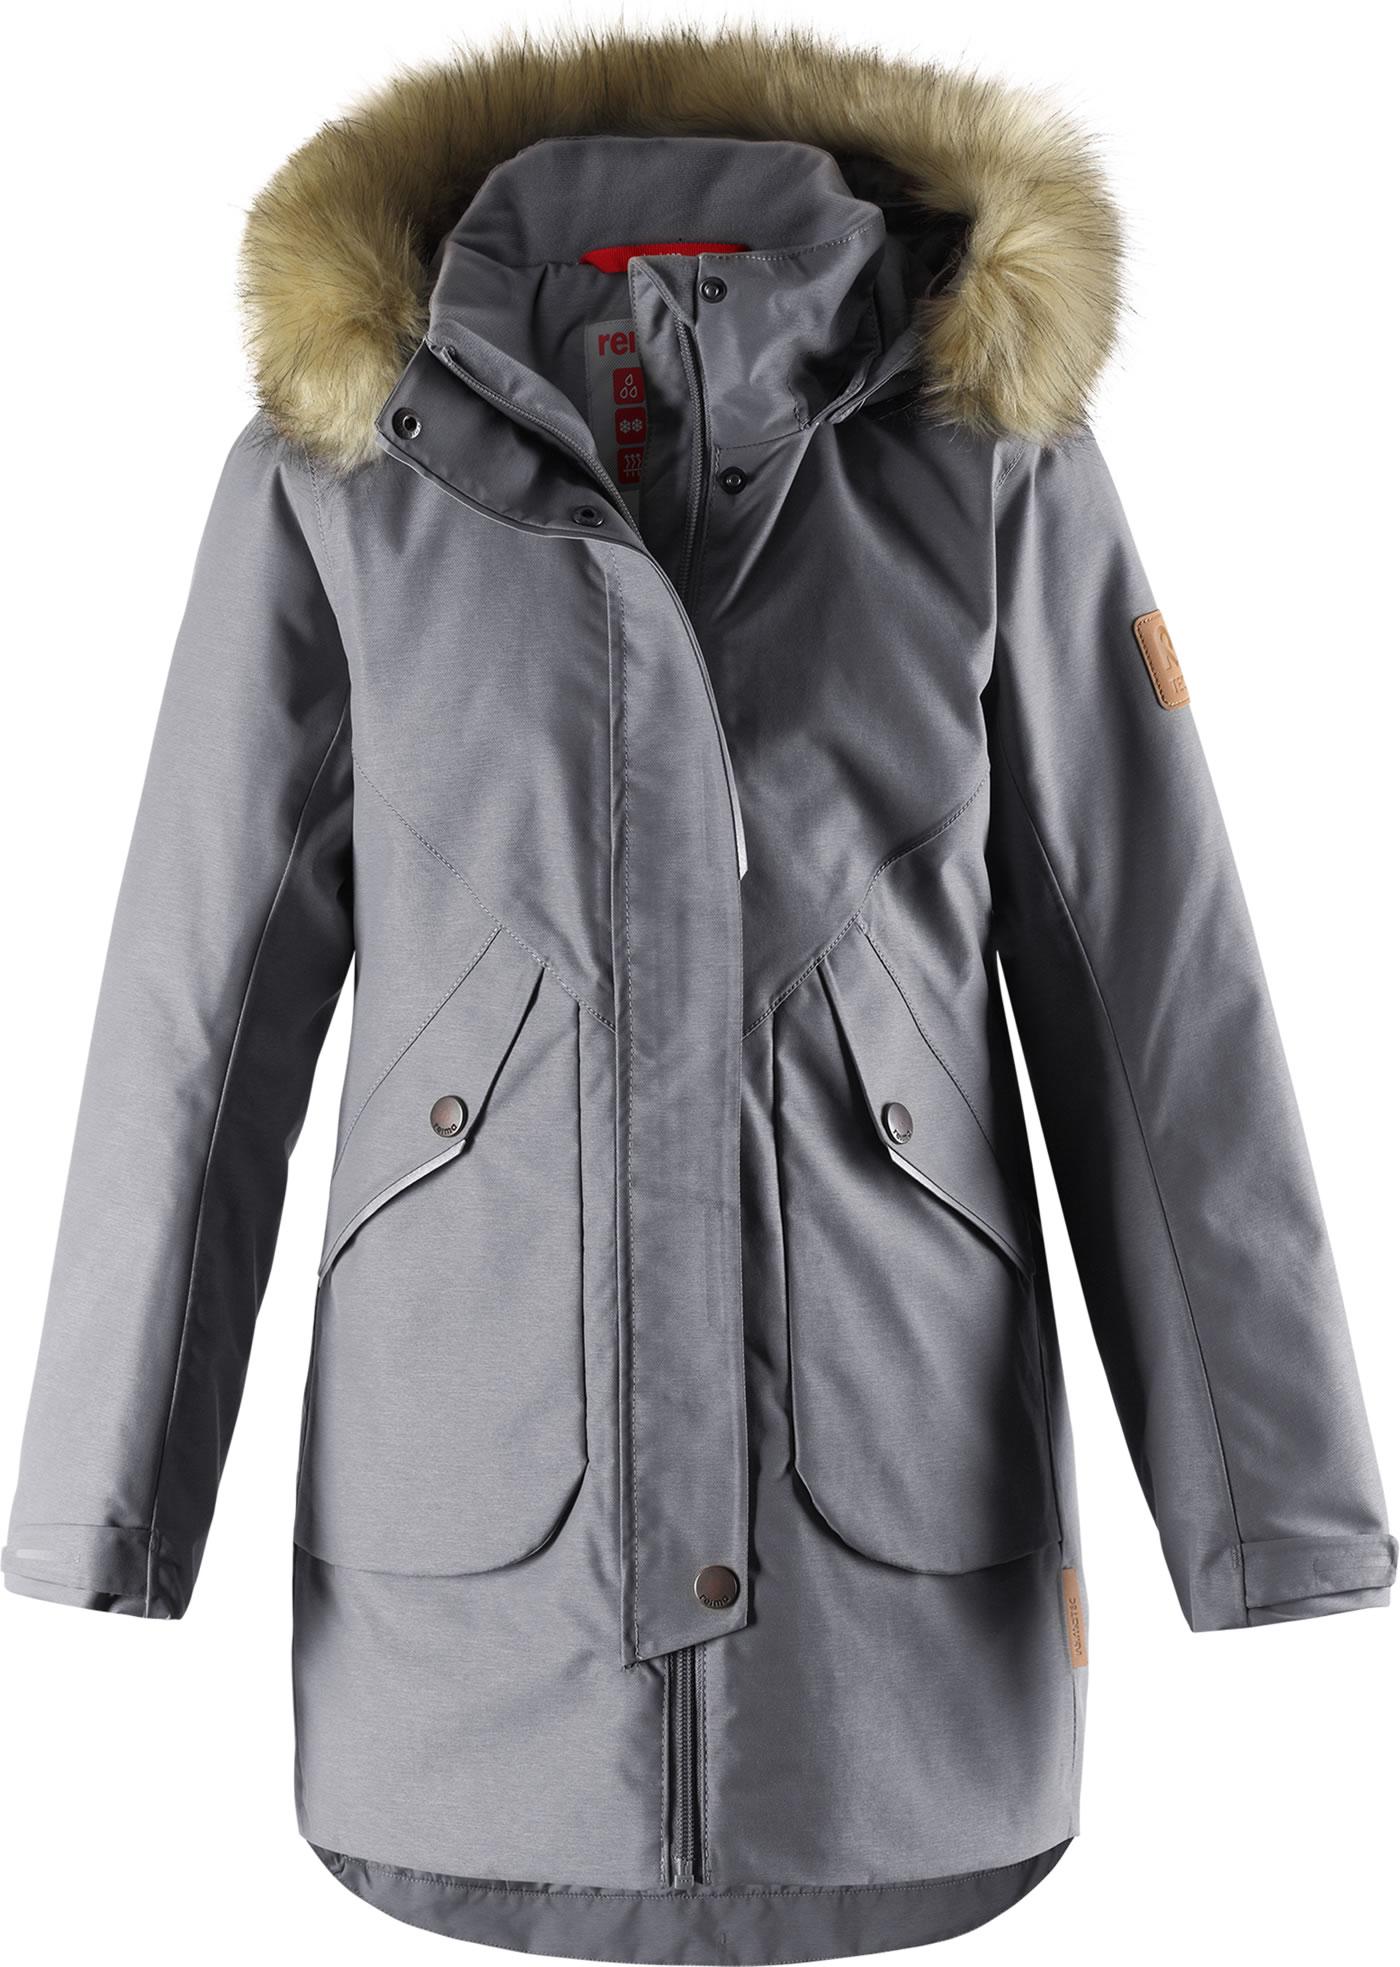 Reima Winterjacke Parka Reimatec® INARI soft grey 531422 9370